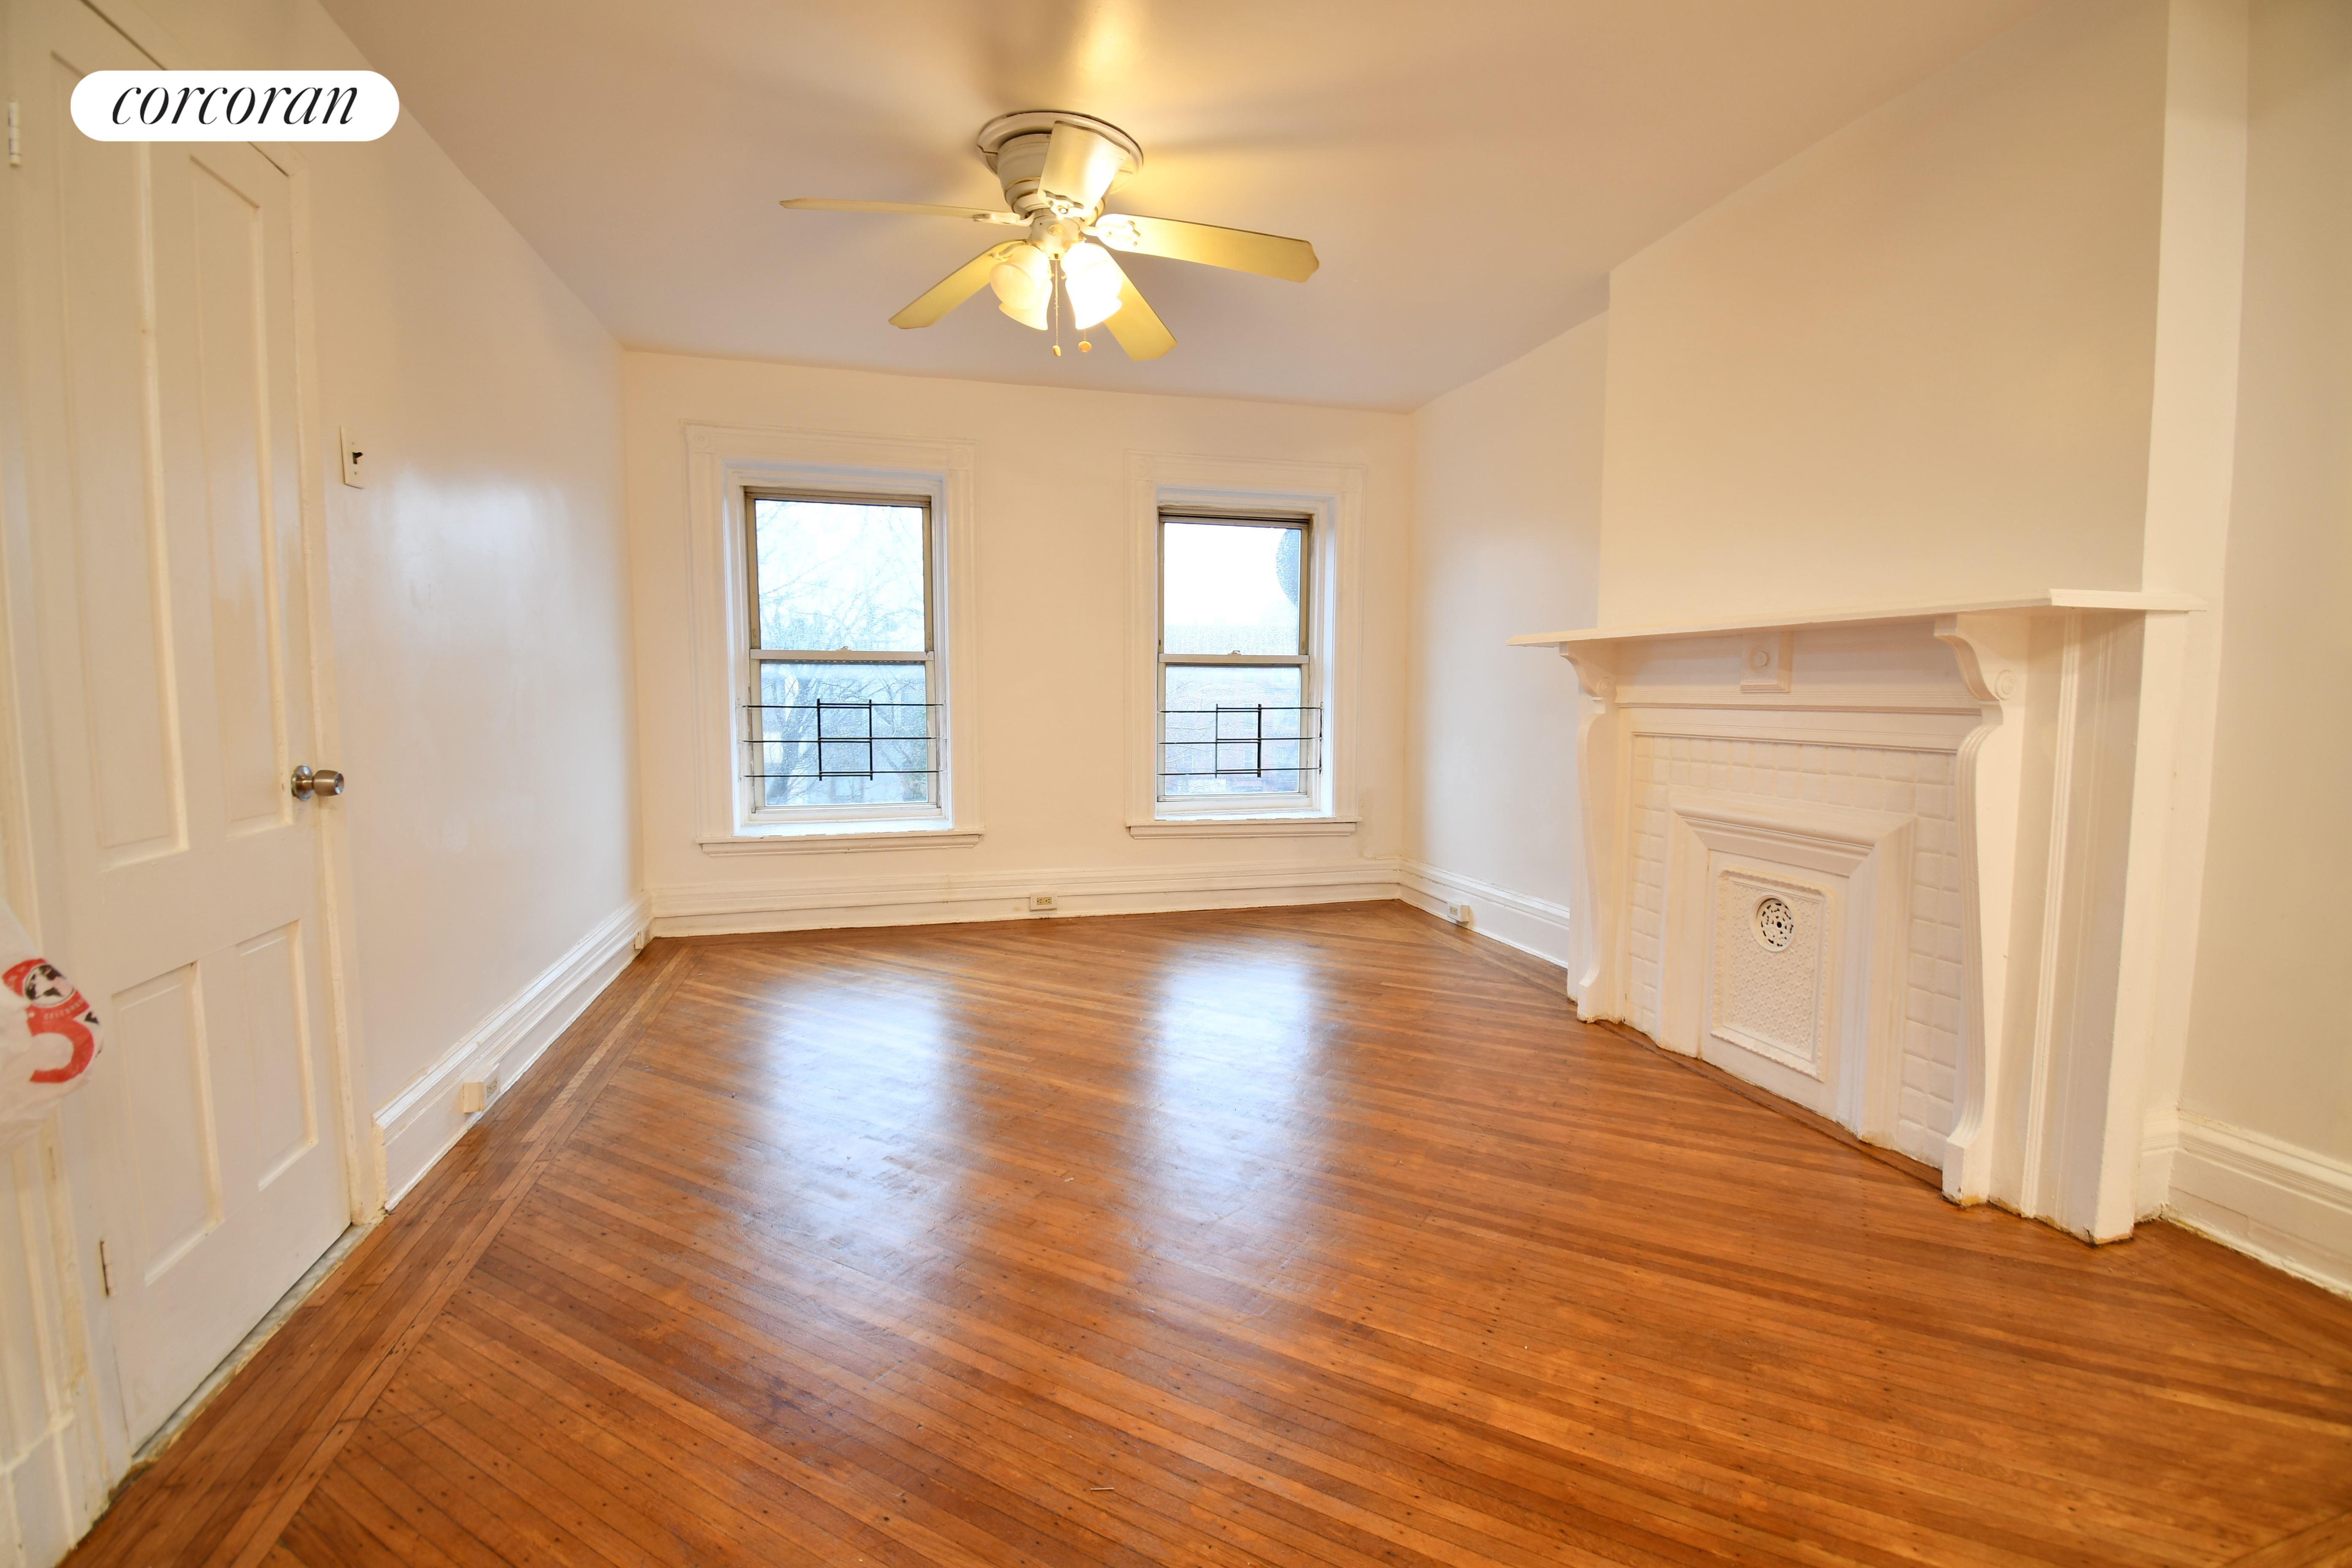 602 MacDonough Street 3 Bedford Stuyvesant Brooklyn NY 11233